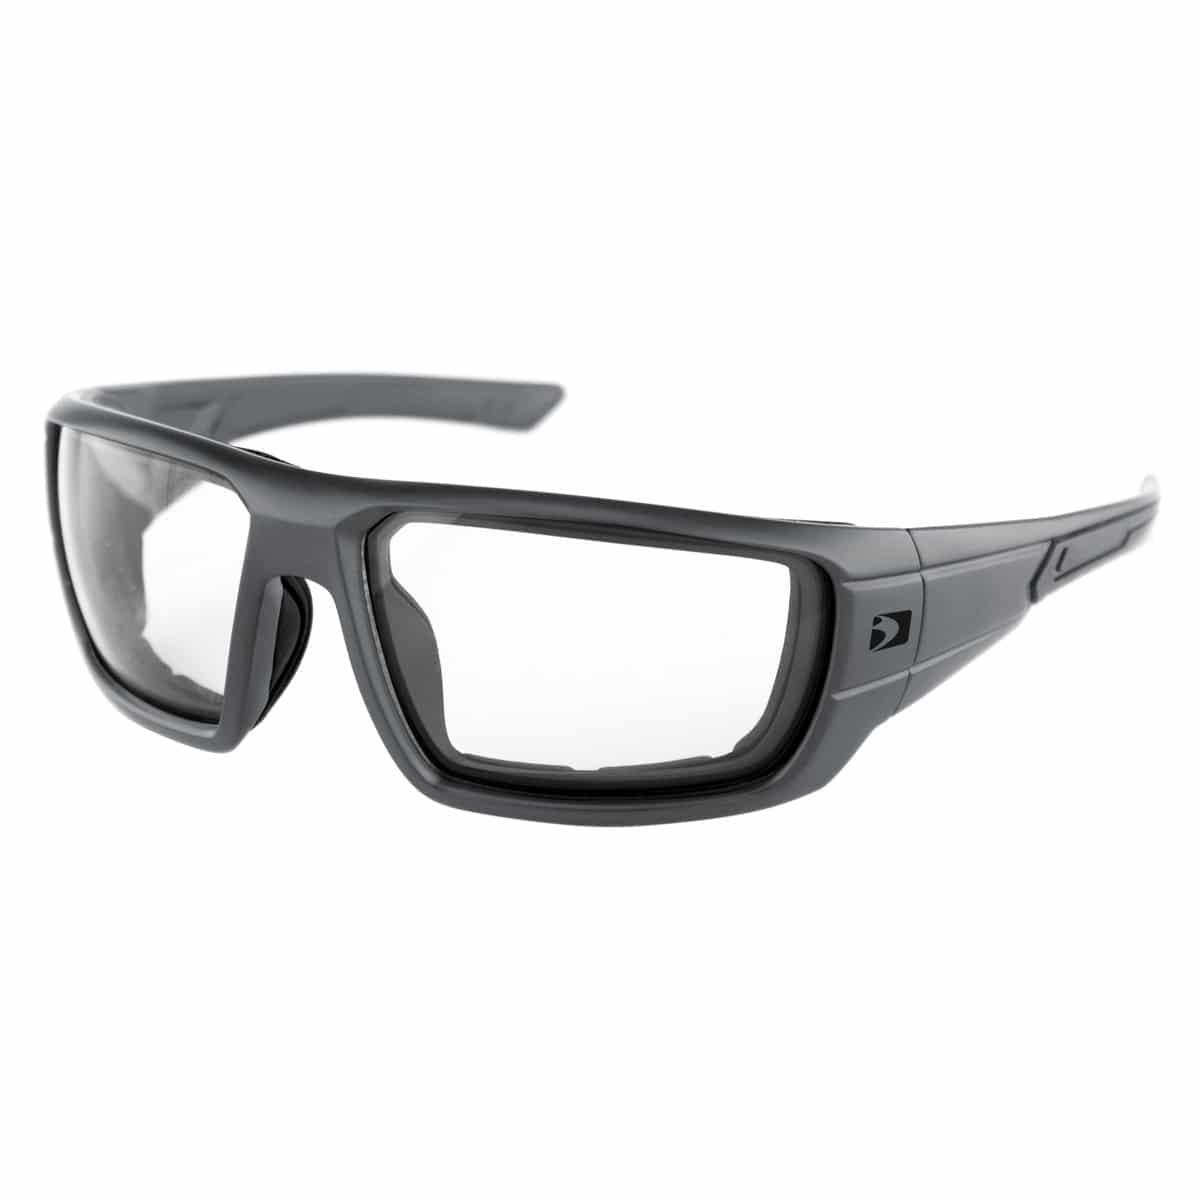 MISSIONMGC_Safety-Gear-Pro-Marvel-Optics